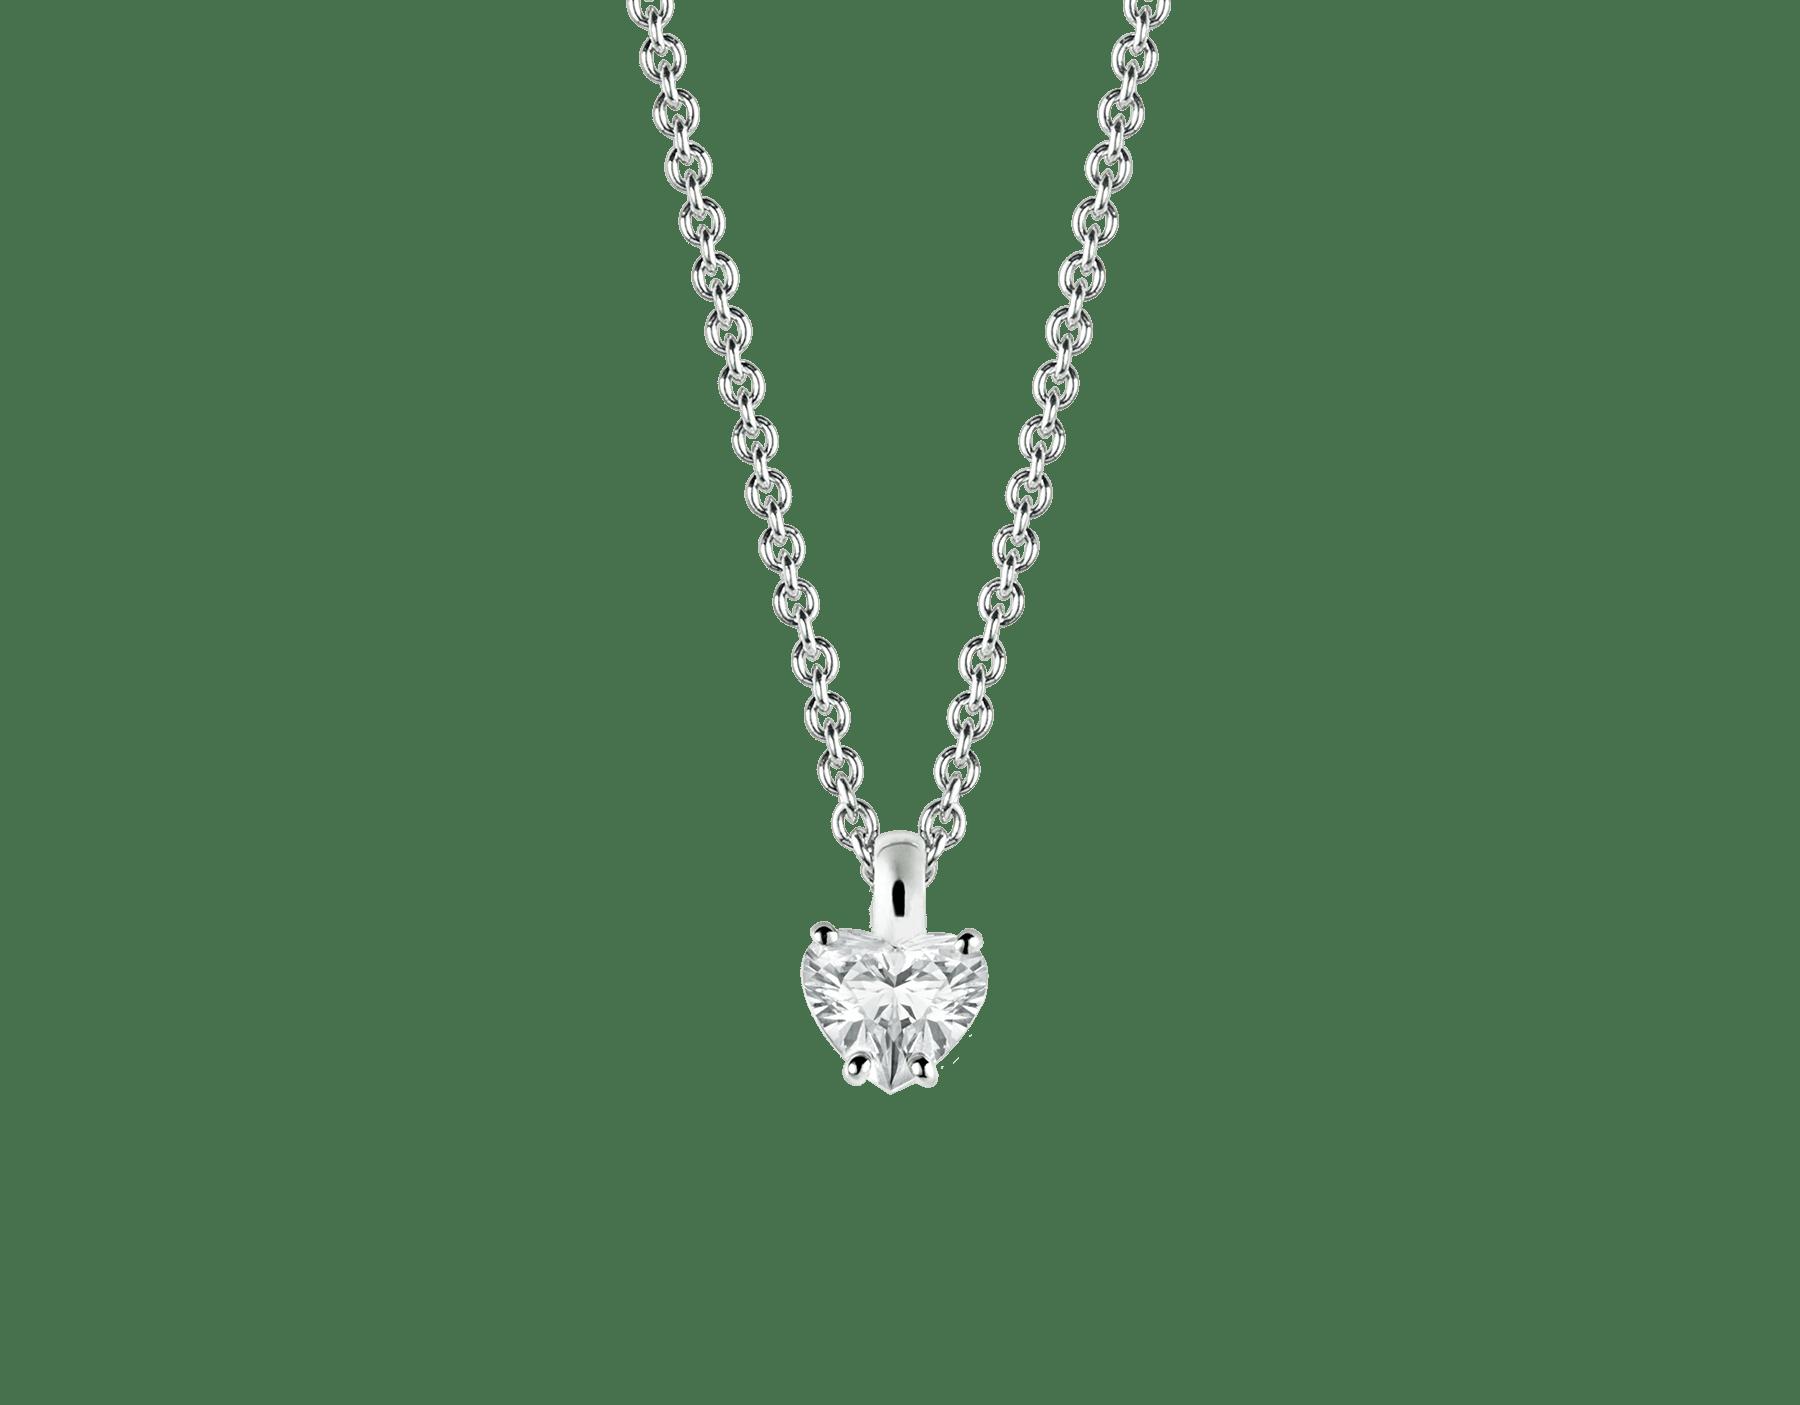 Griffe 18K 白金項墜鑲飾心形切割鑽石,18K 白金鍊帶。 338204 image 1